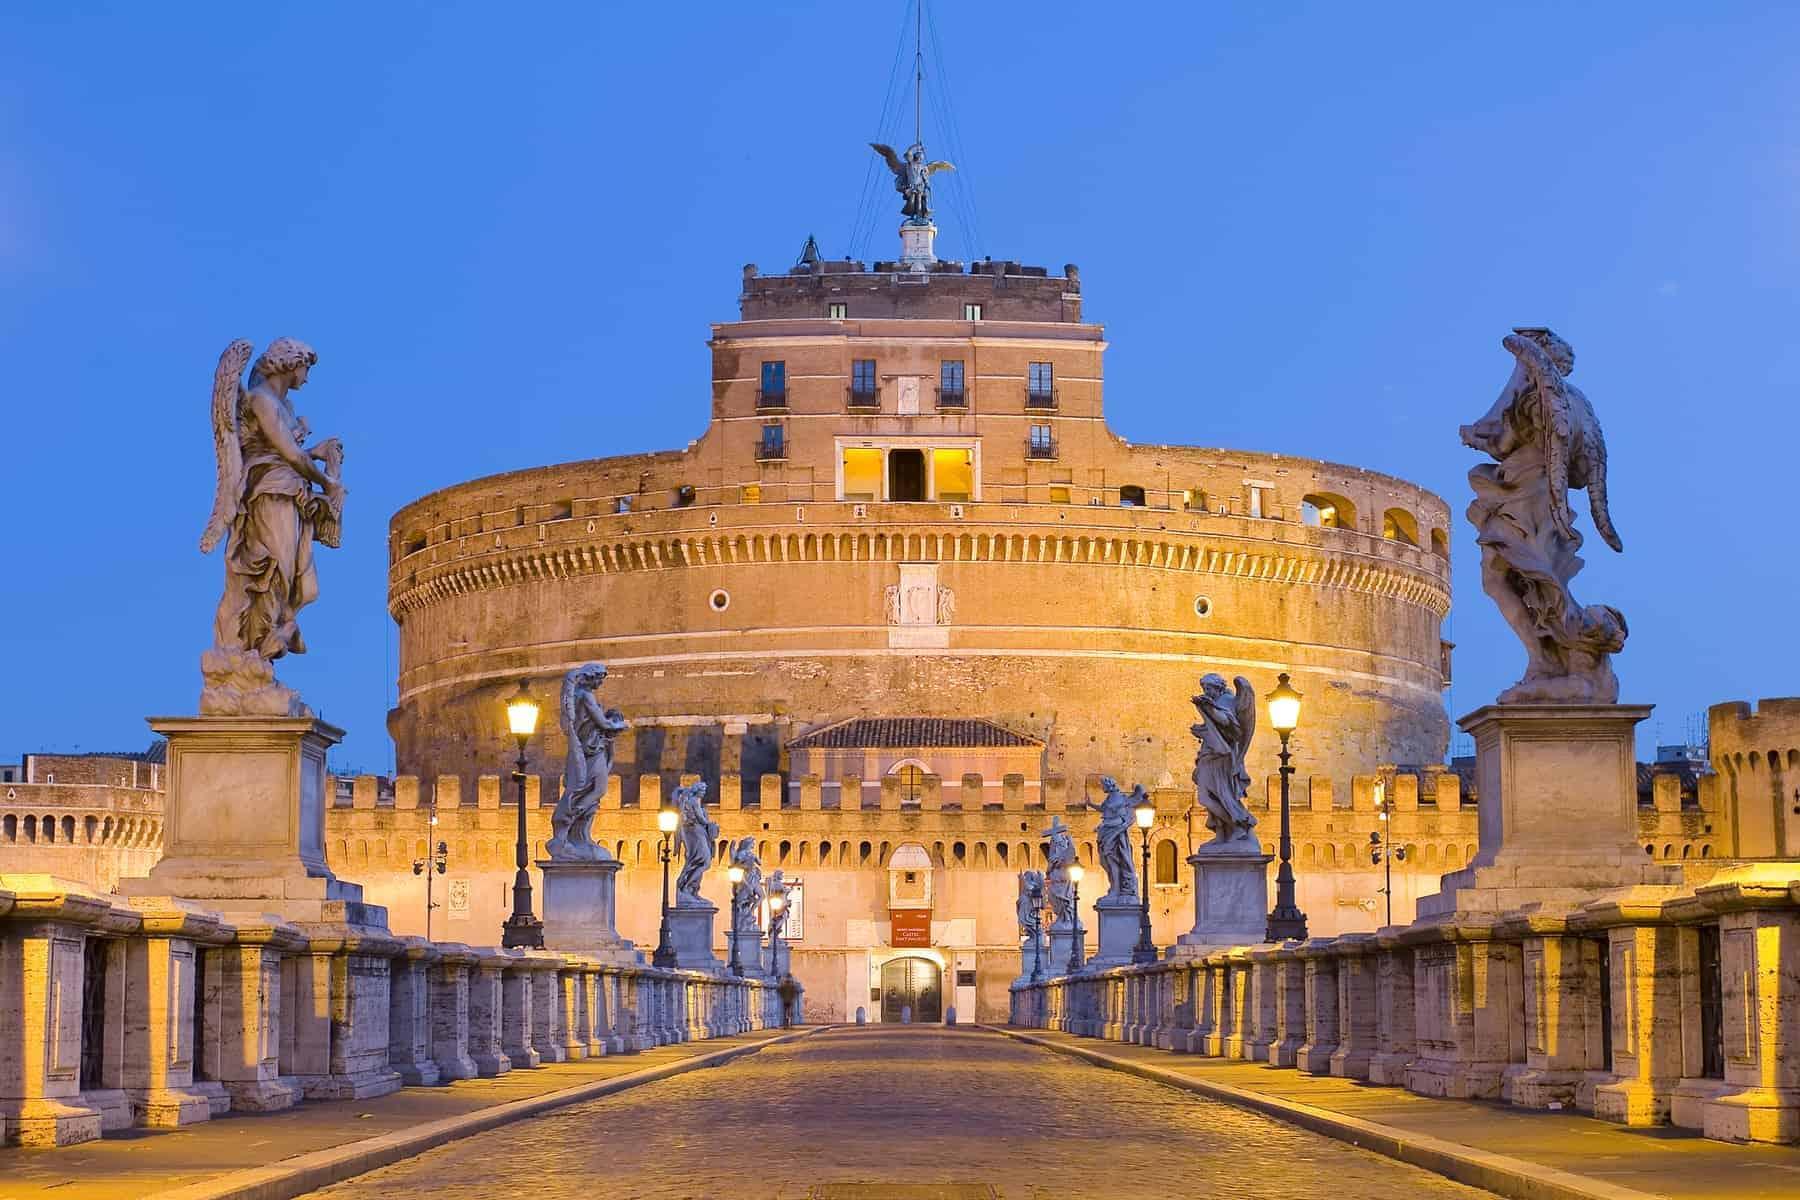 Castel Santangelo in Rome, Italy.